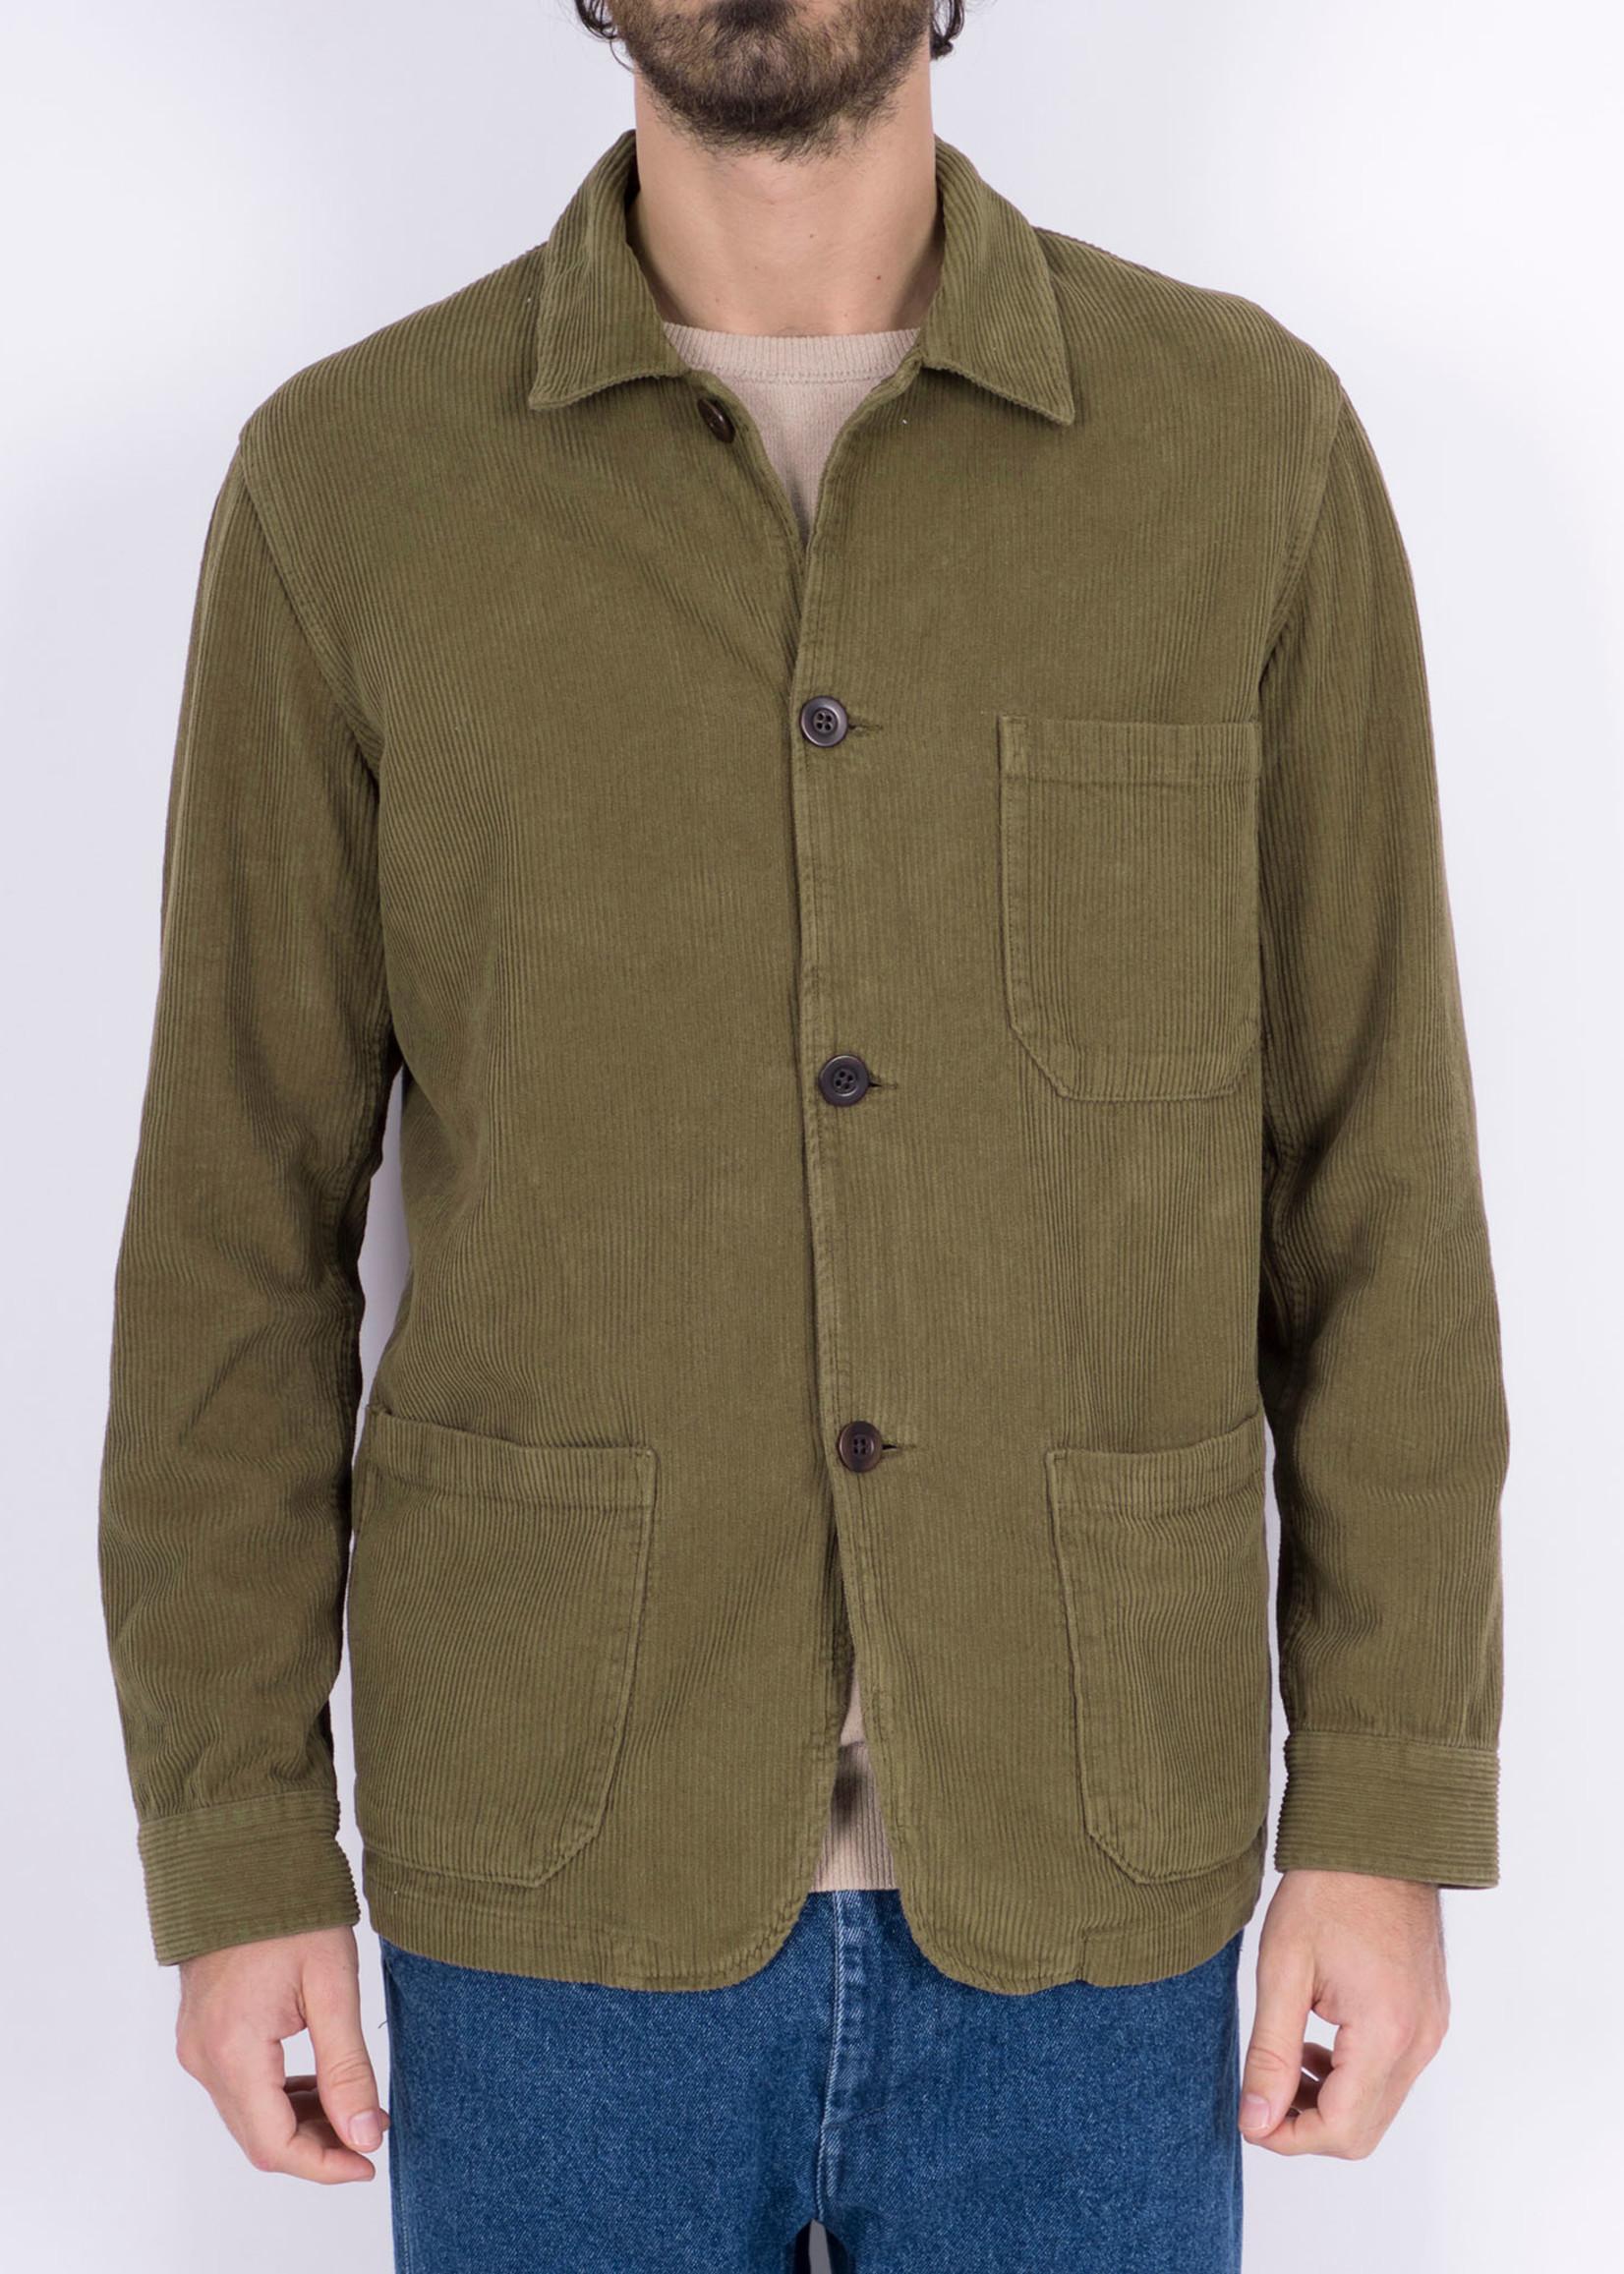 Portuguese Flannel Labura Olive Corduroy Chore Jacket by Portuguese Flannel